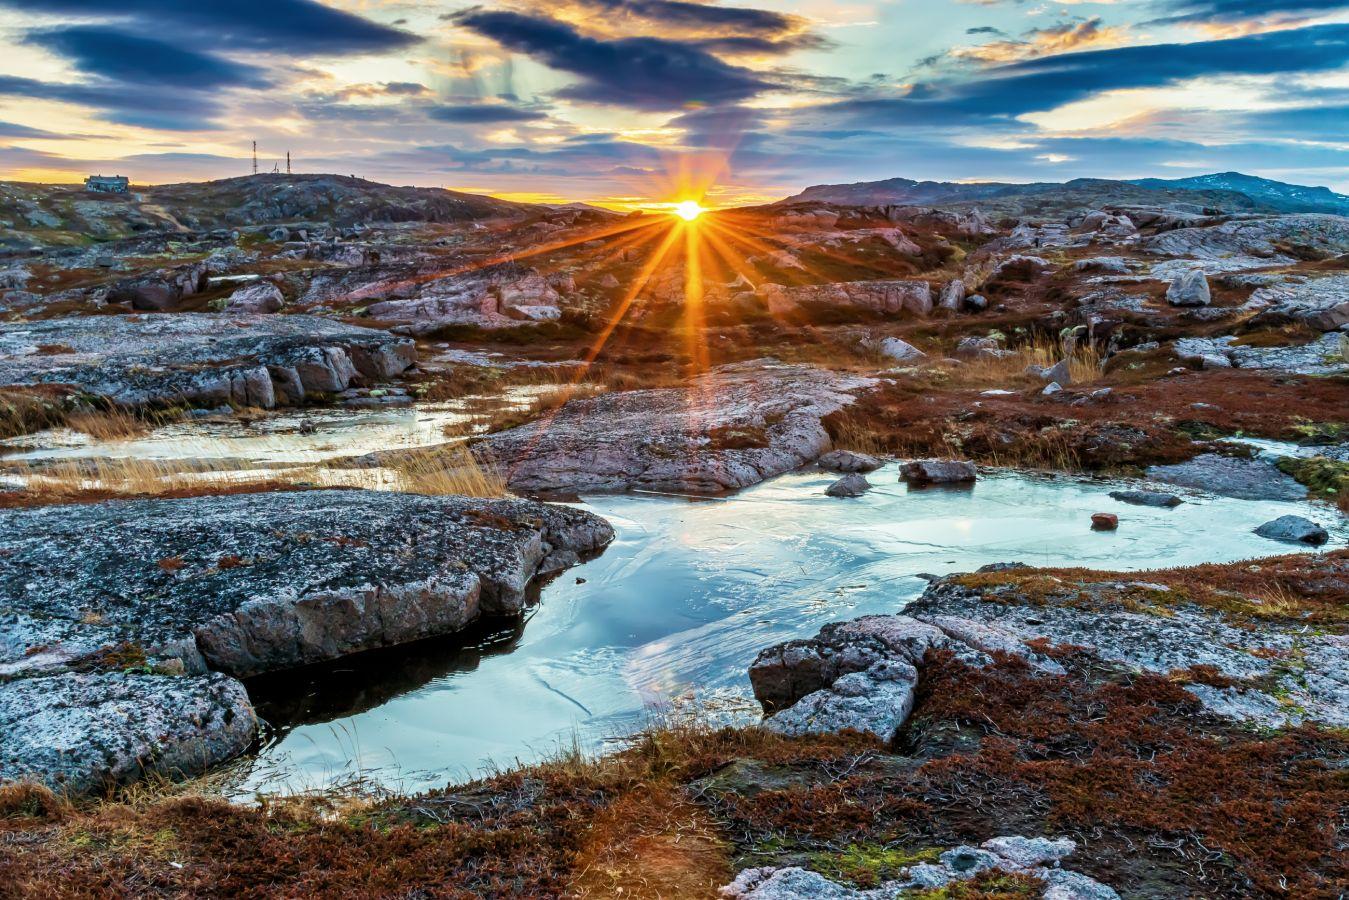 «Краски северного заката». Автор: Владимир Иванов